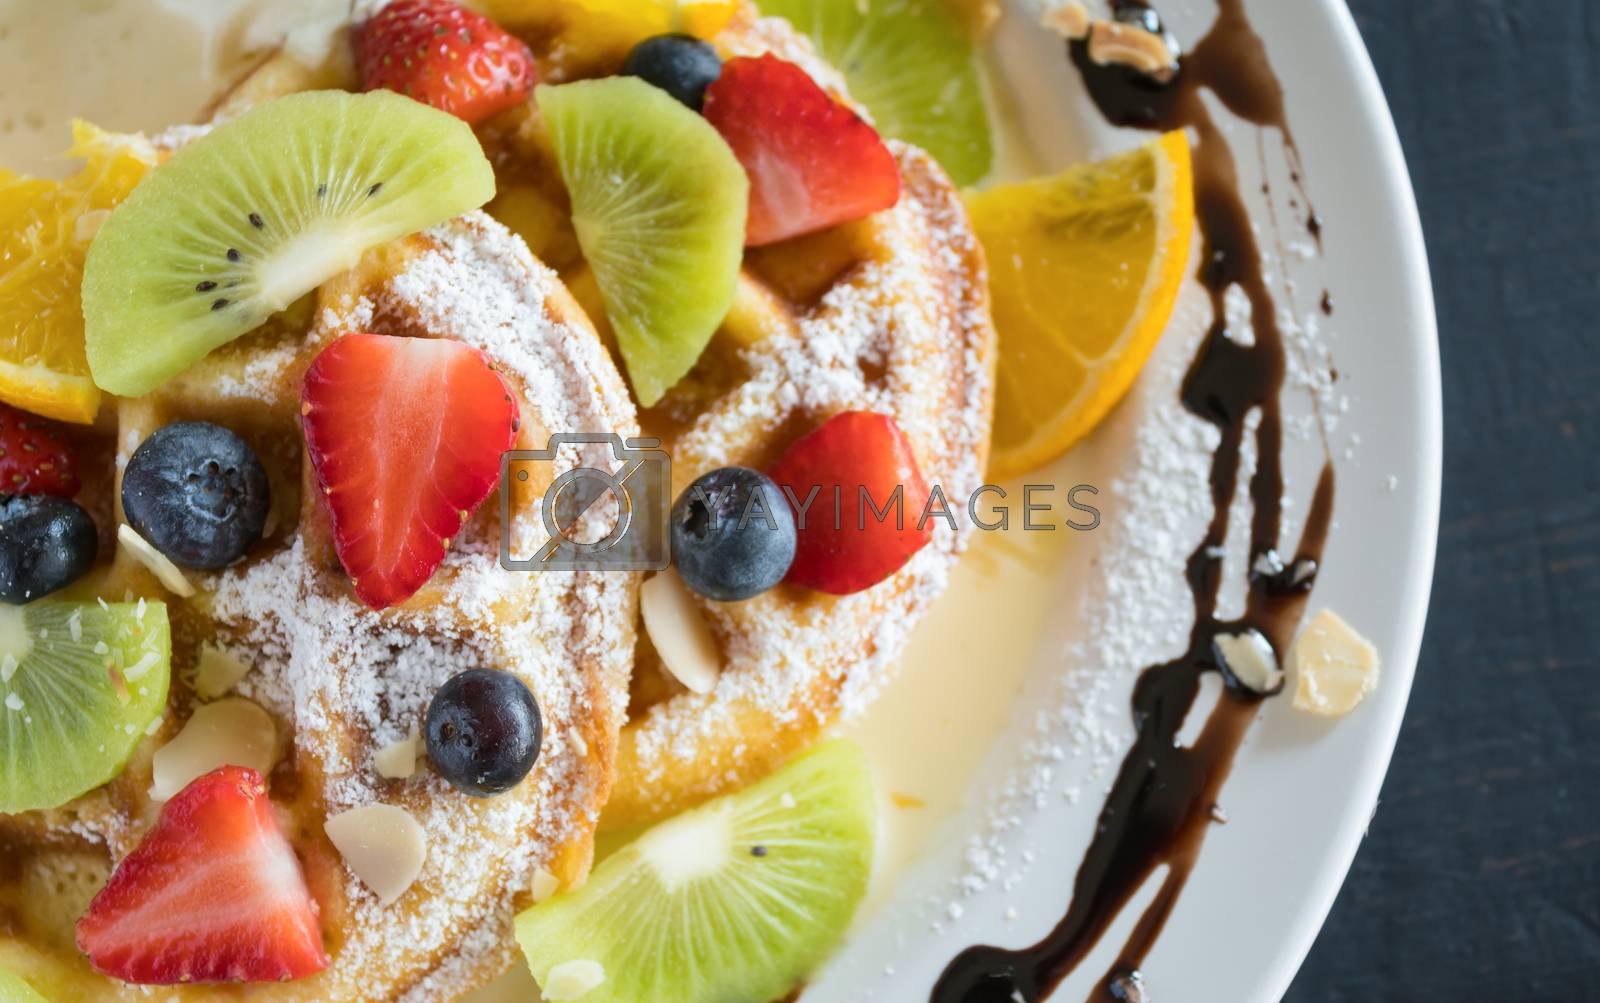 Flatlay Half Strawberry Blueberry Kiwi Lemon Waffle Chocolate Dessert. Fruity dessert food and drink category